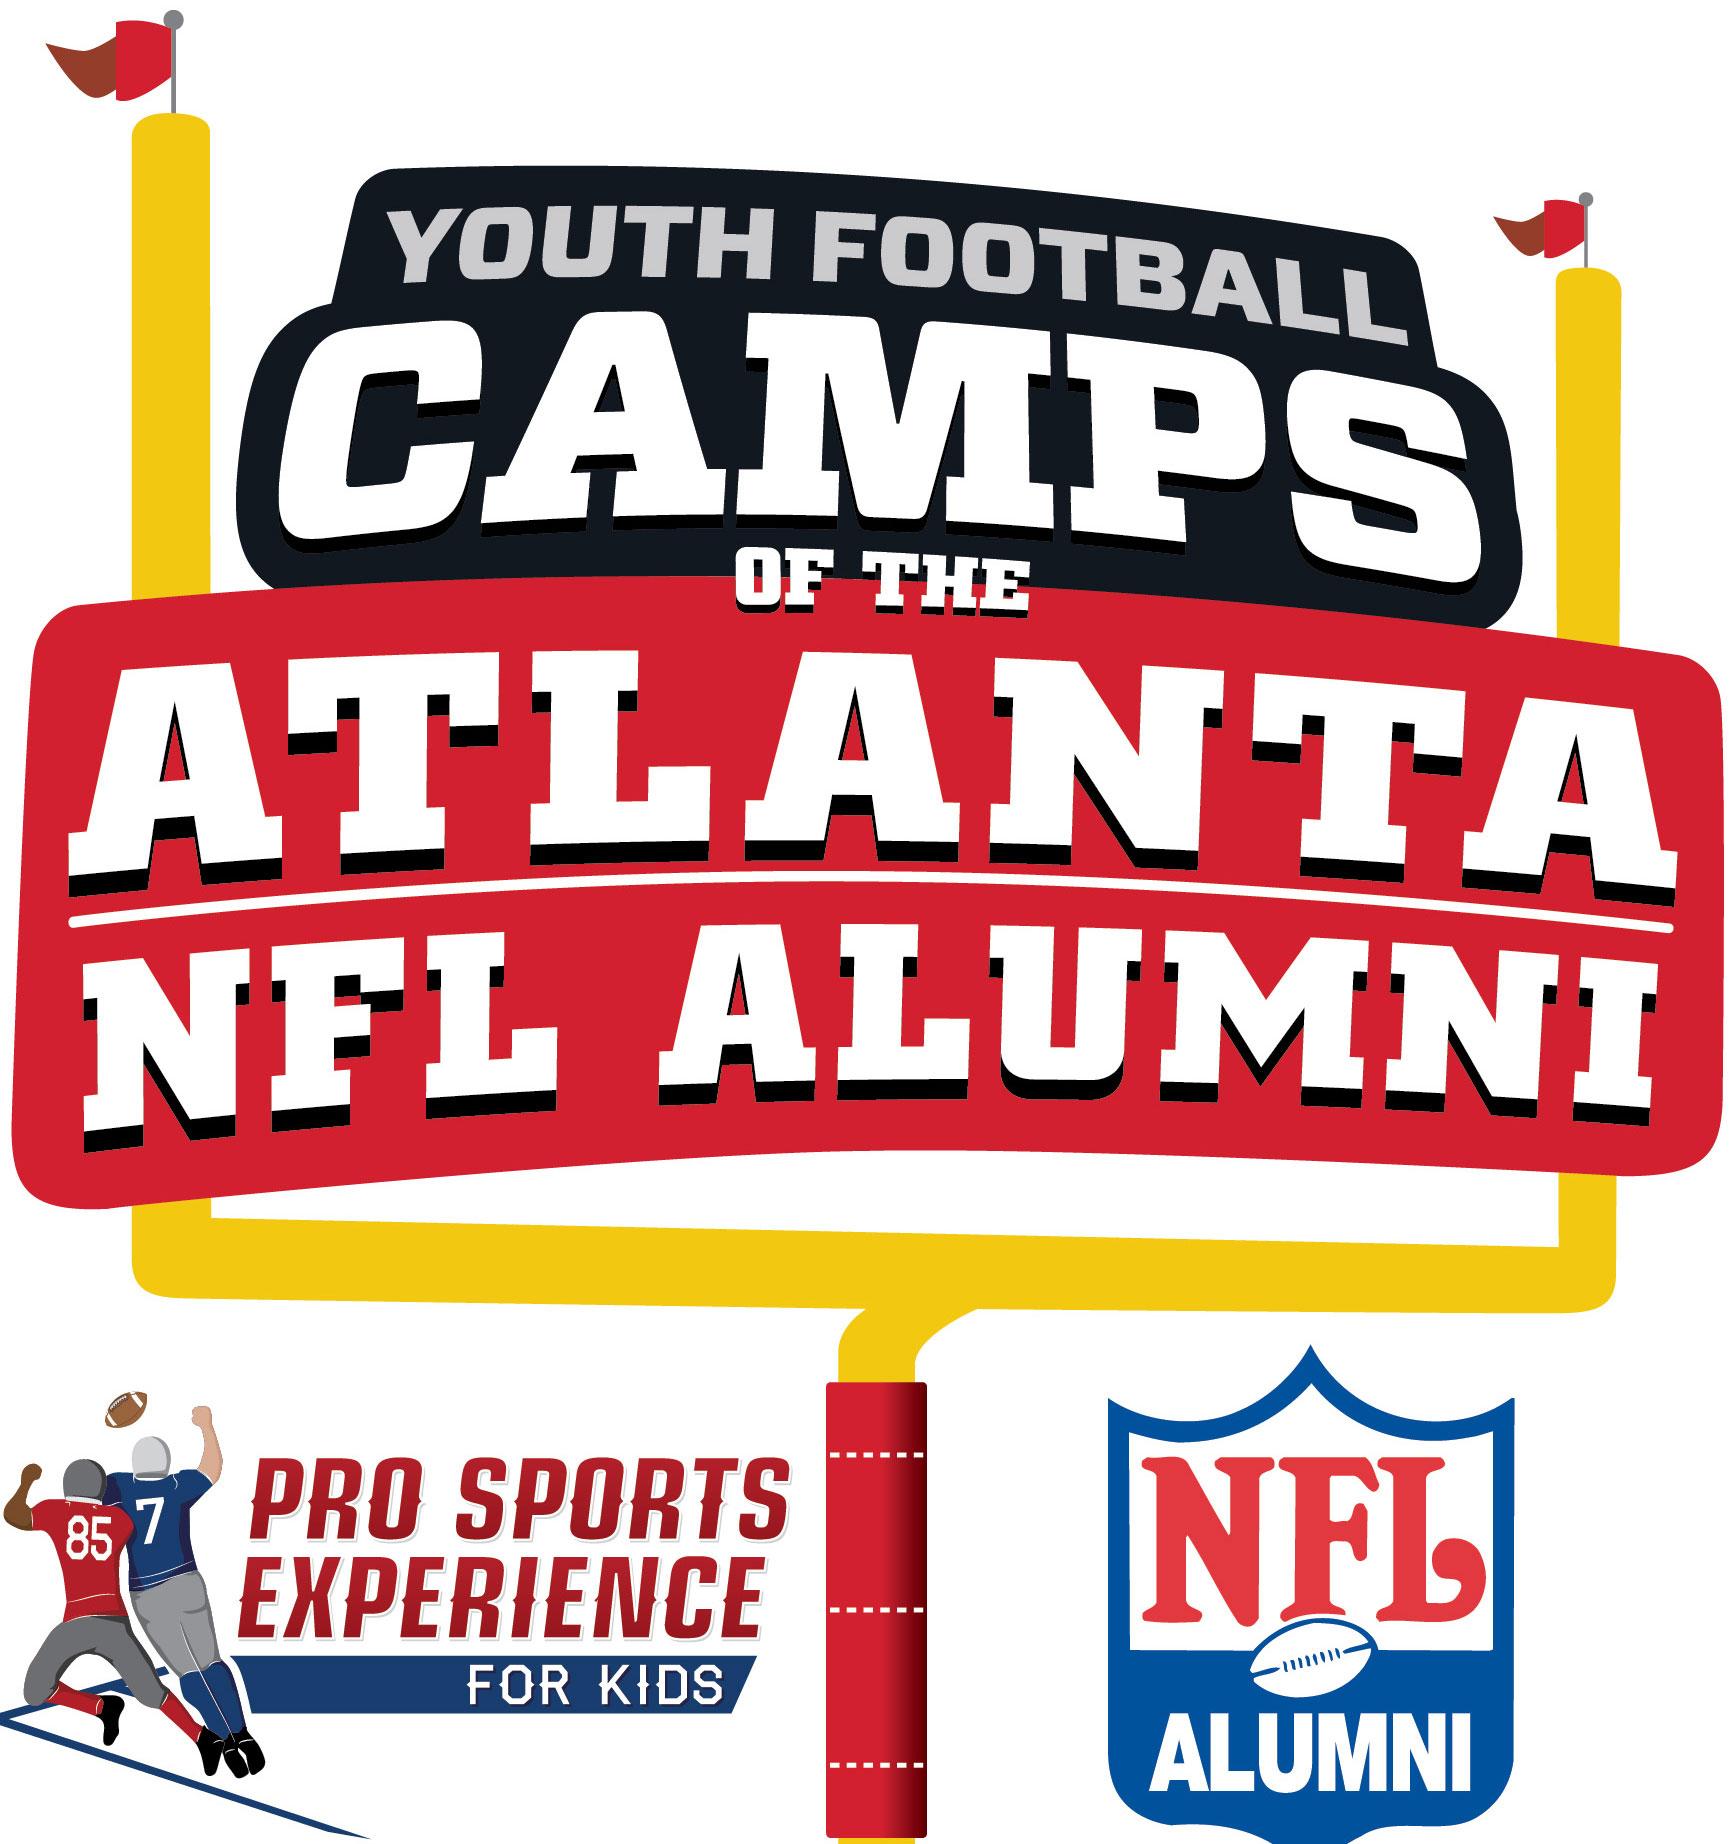 Atlanta NFL Alumni Hero Youth Football Camps - Douglasville